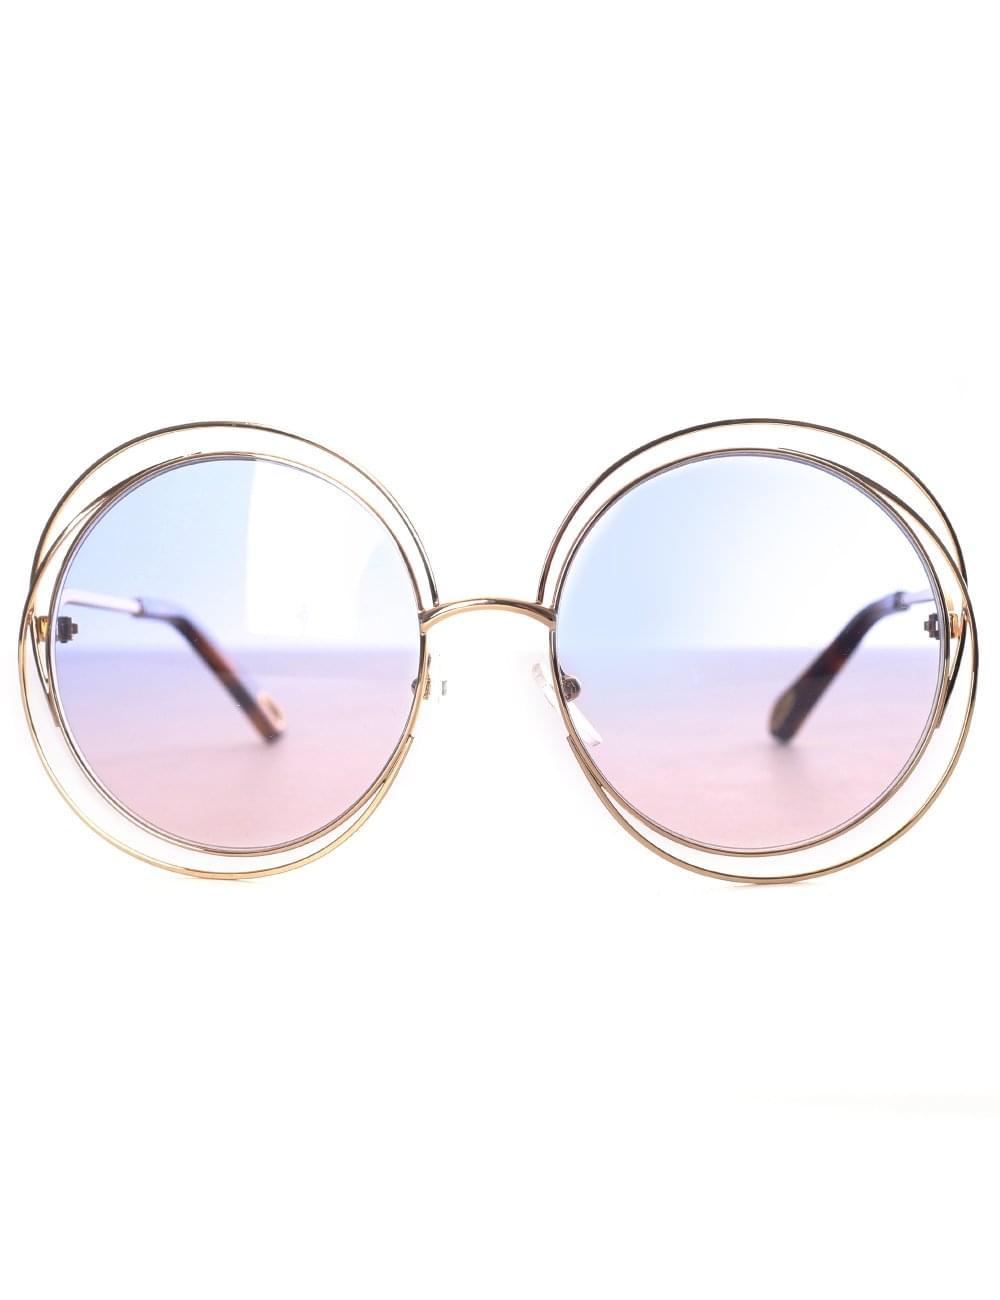 8412516f57d2 Chloe Women s Carlina Sunglasses